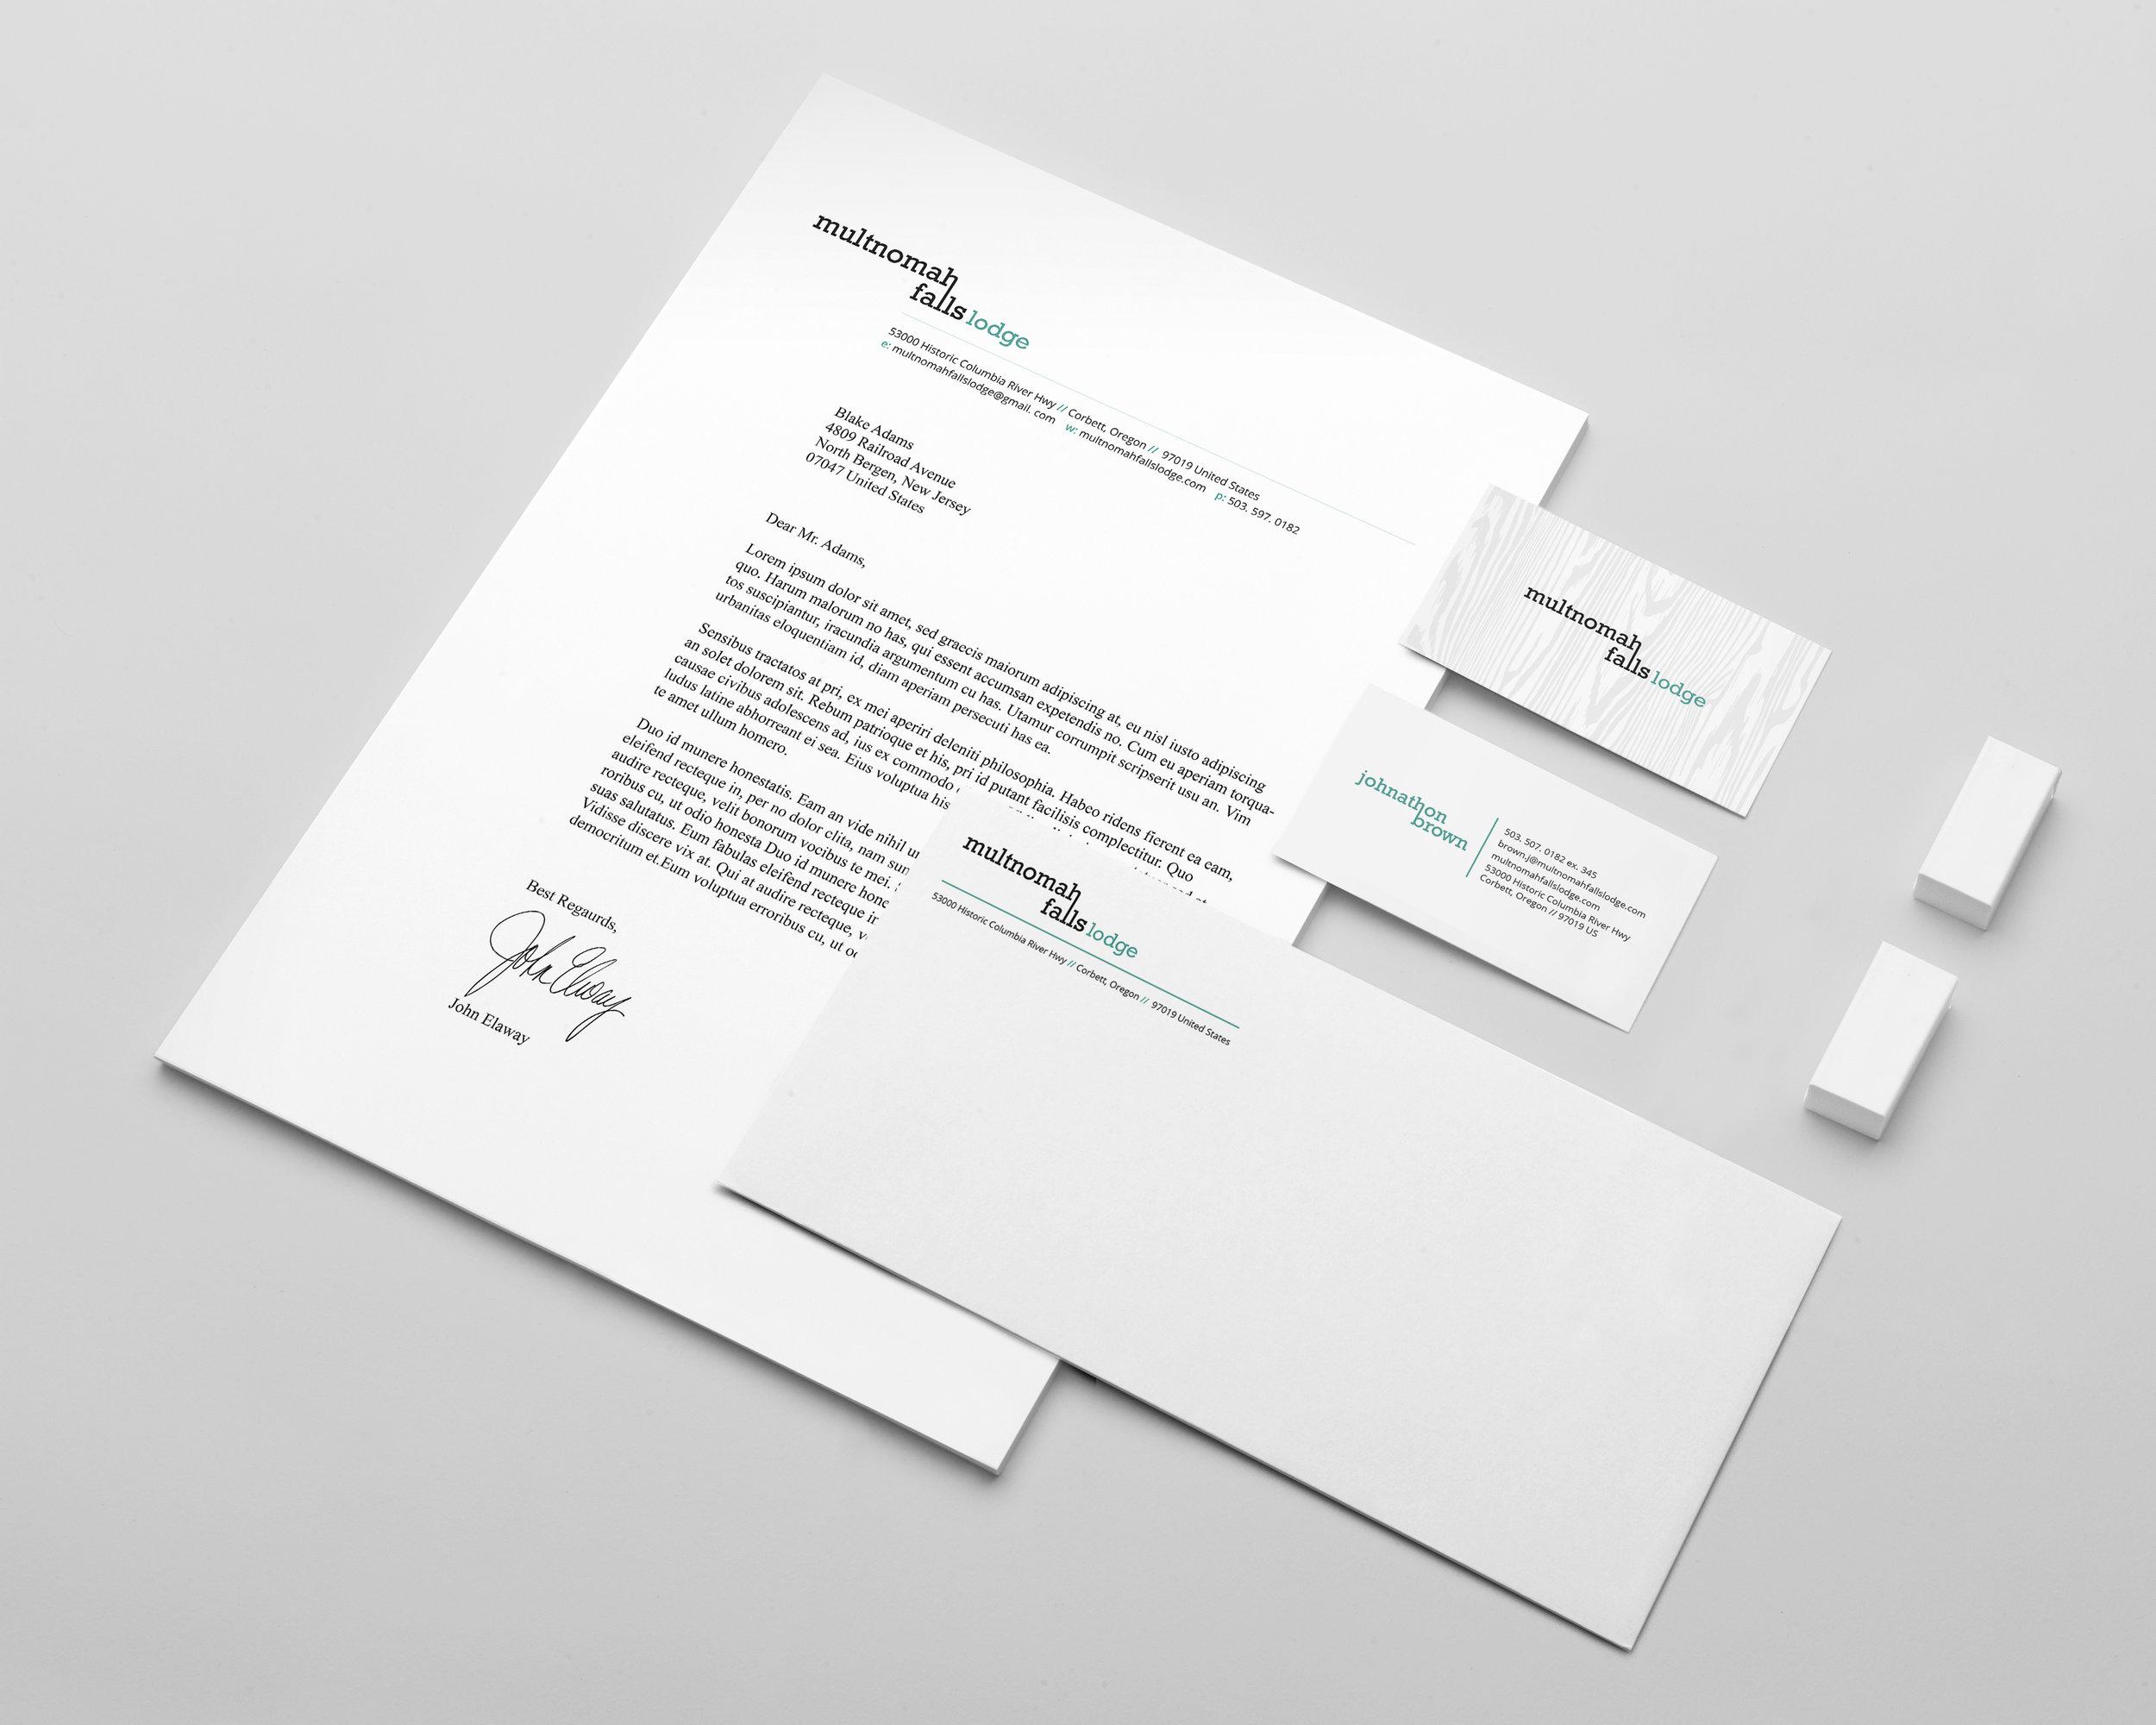 Stationery Mockup Template - Blank.jpg